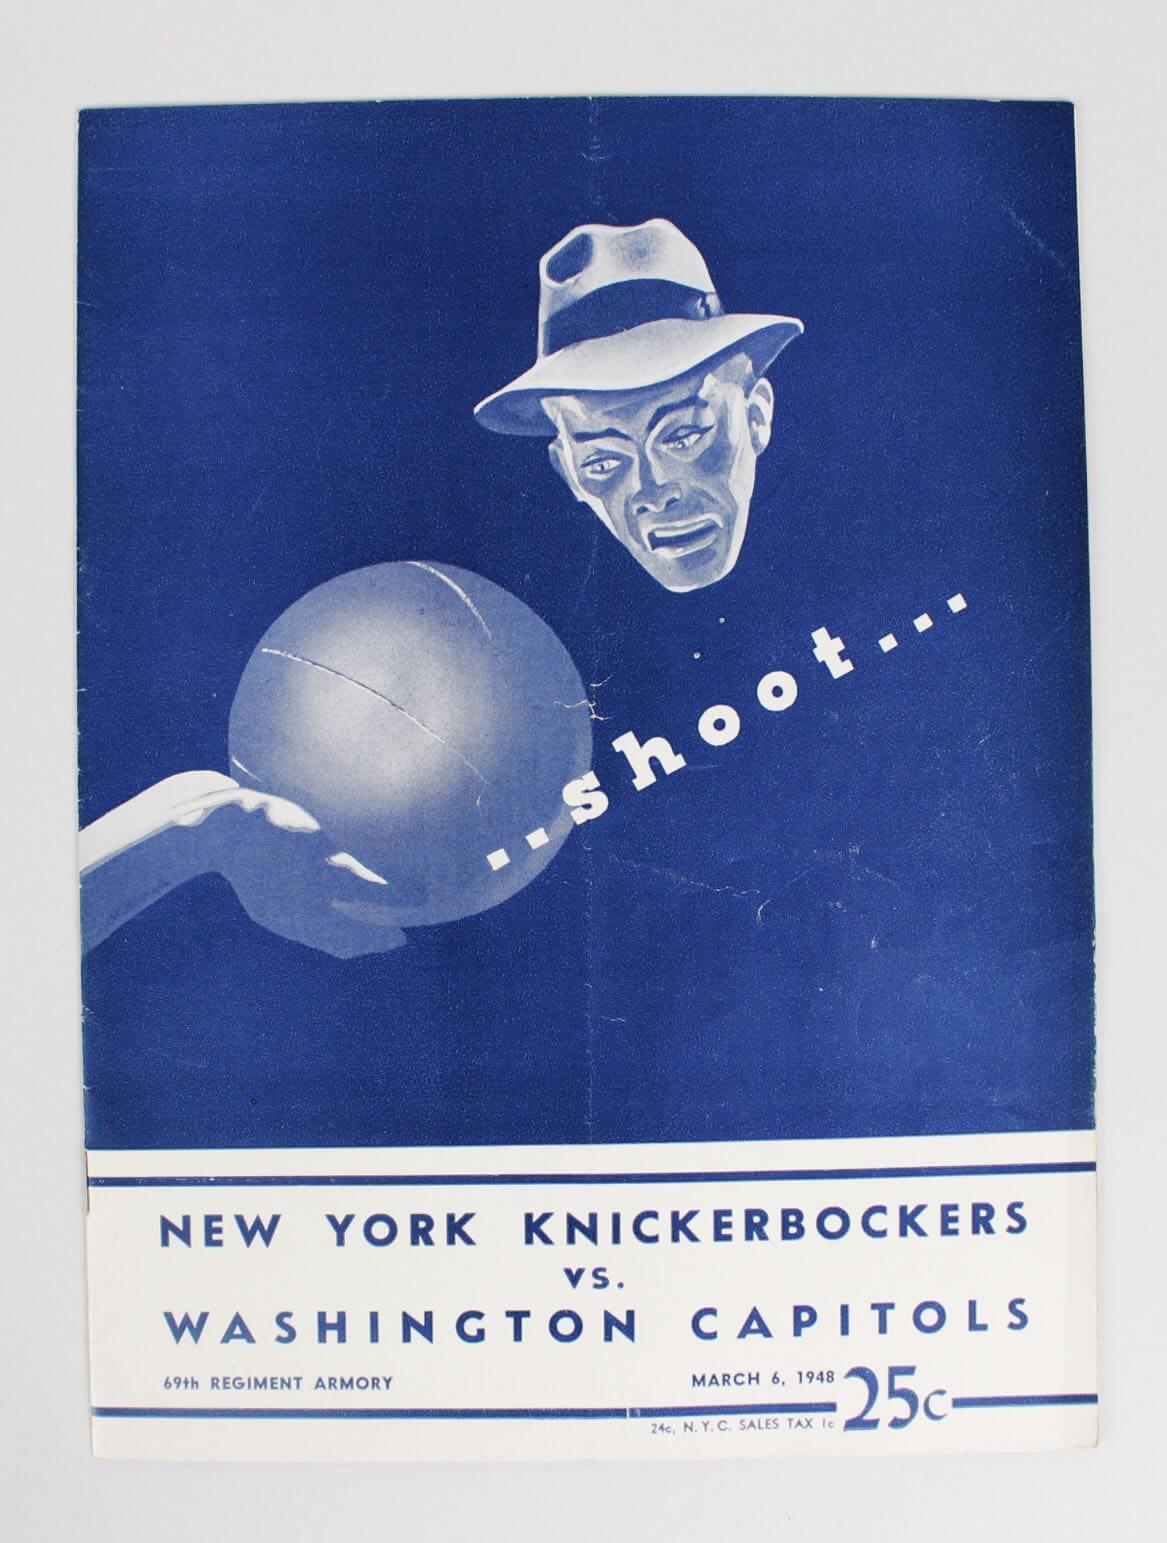 1948 New York knickerbockers Vs. Washington Capitols Program55433_01